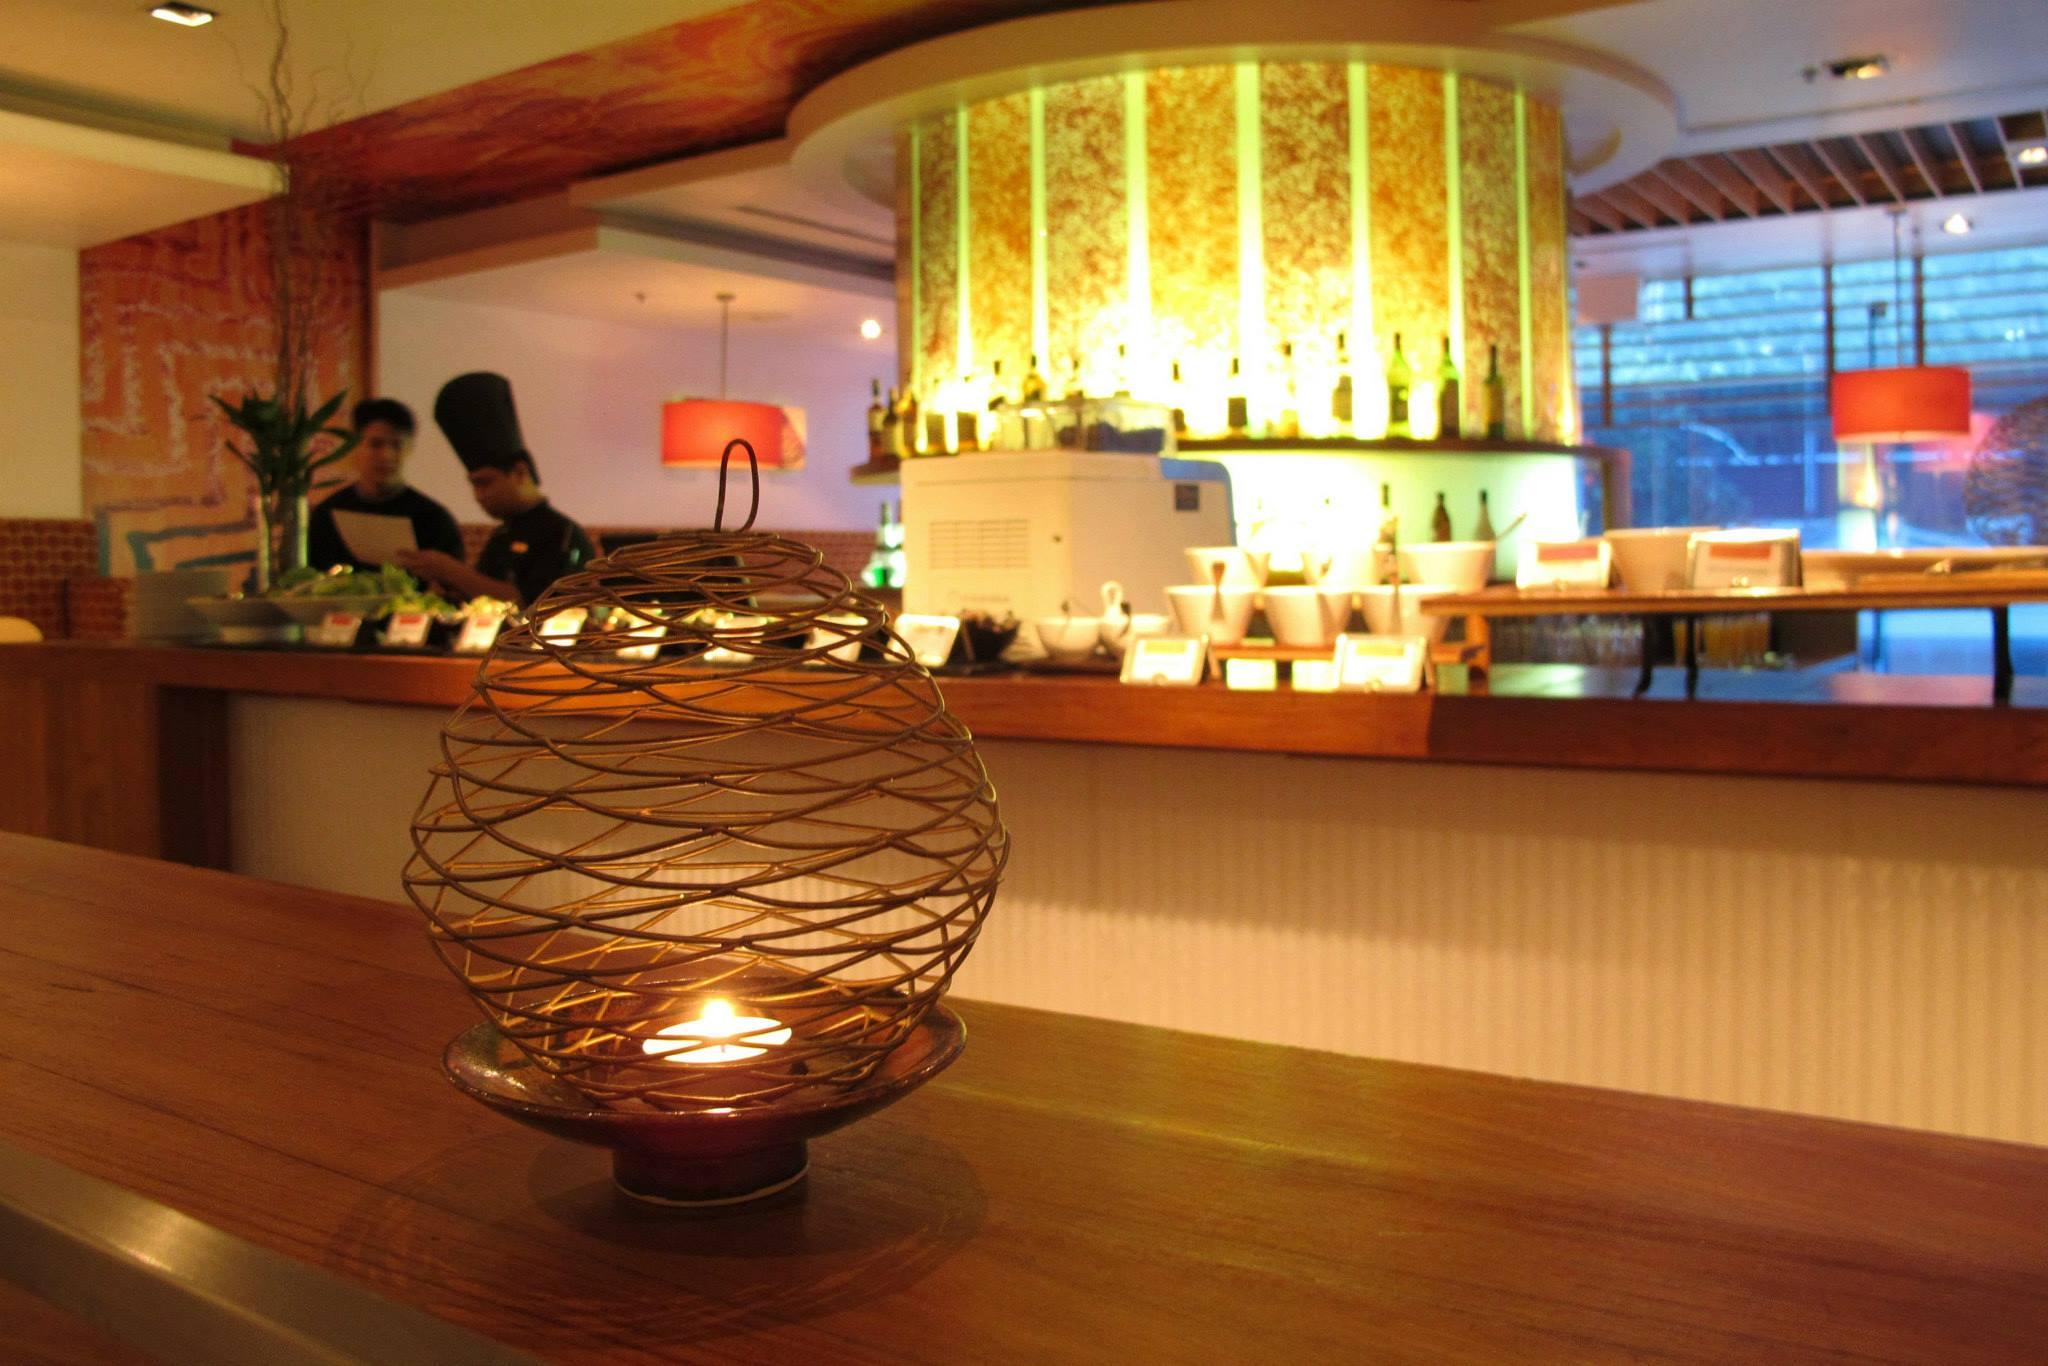 Hotel Istana Seafood Feast Buffet At Hotel Istana Upcoming Event Samadhi